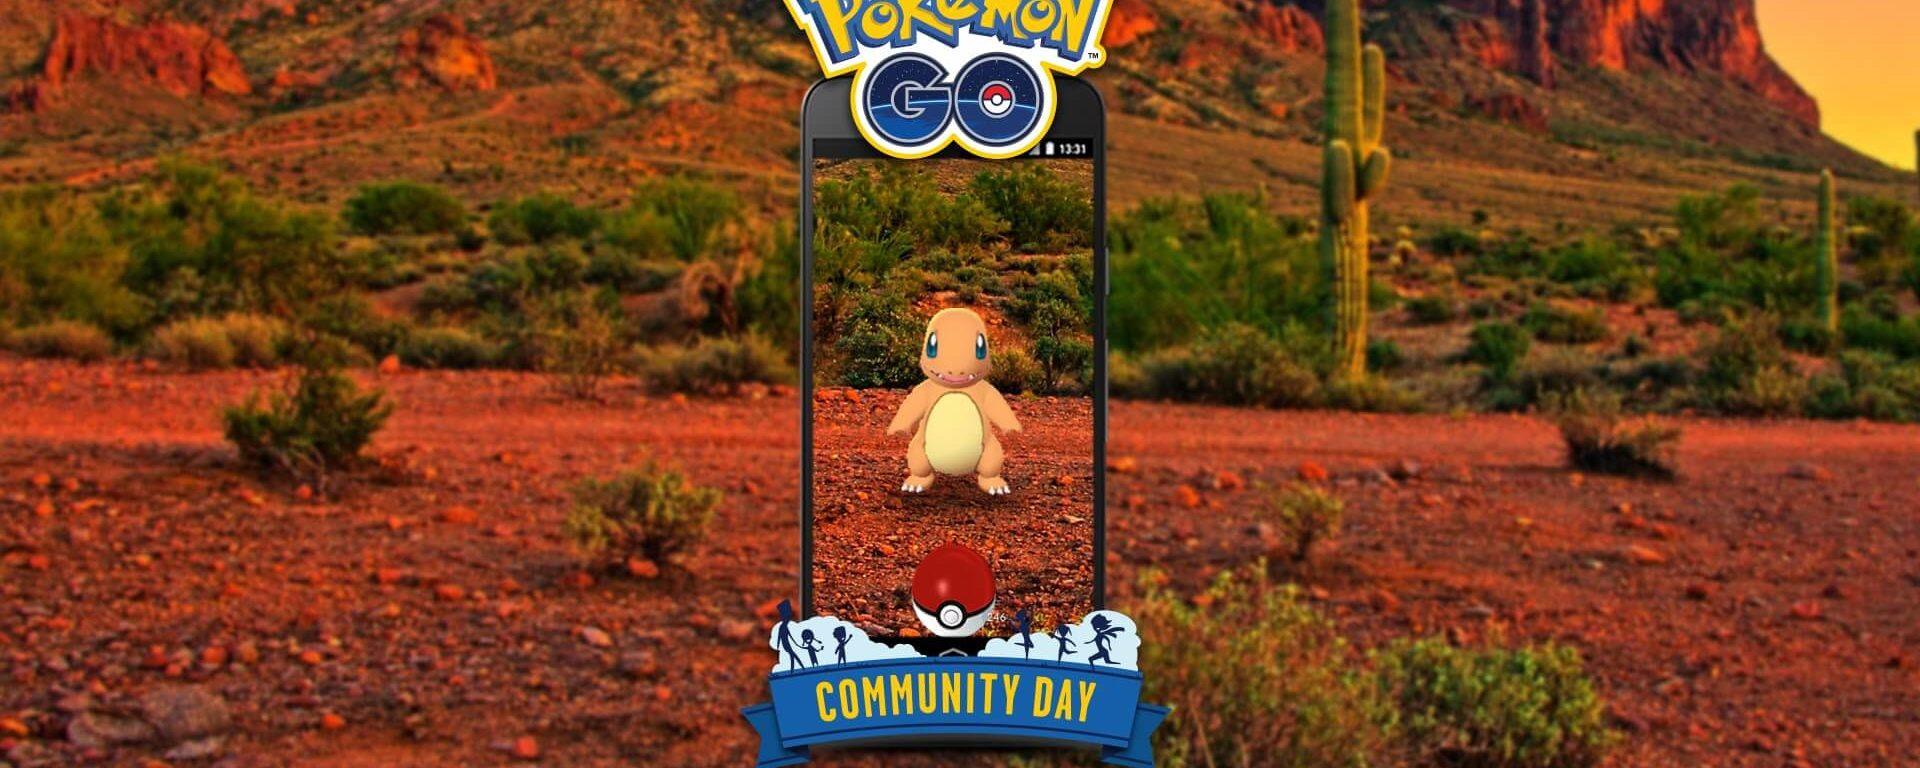 salameche-community-day-pokemon-go